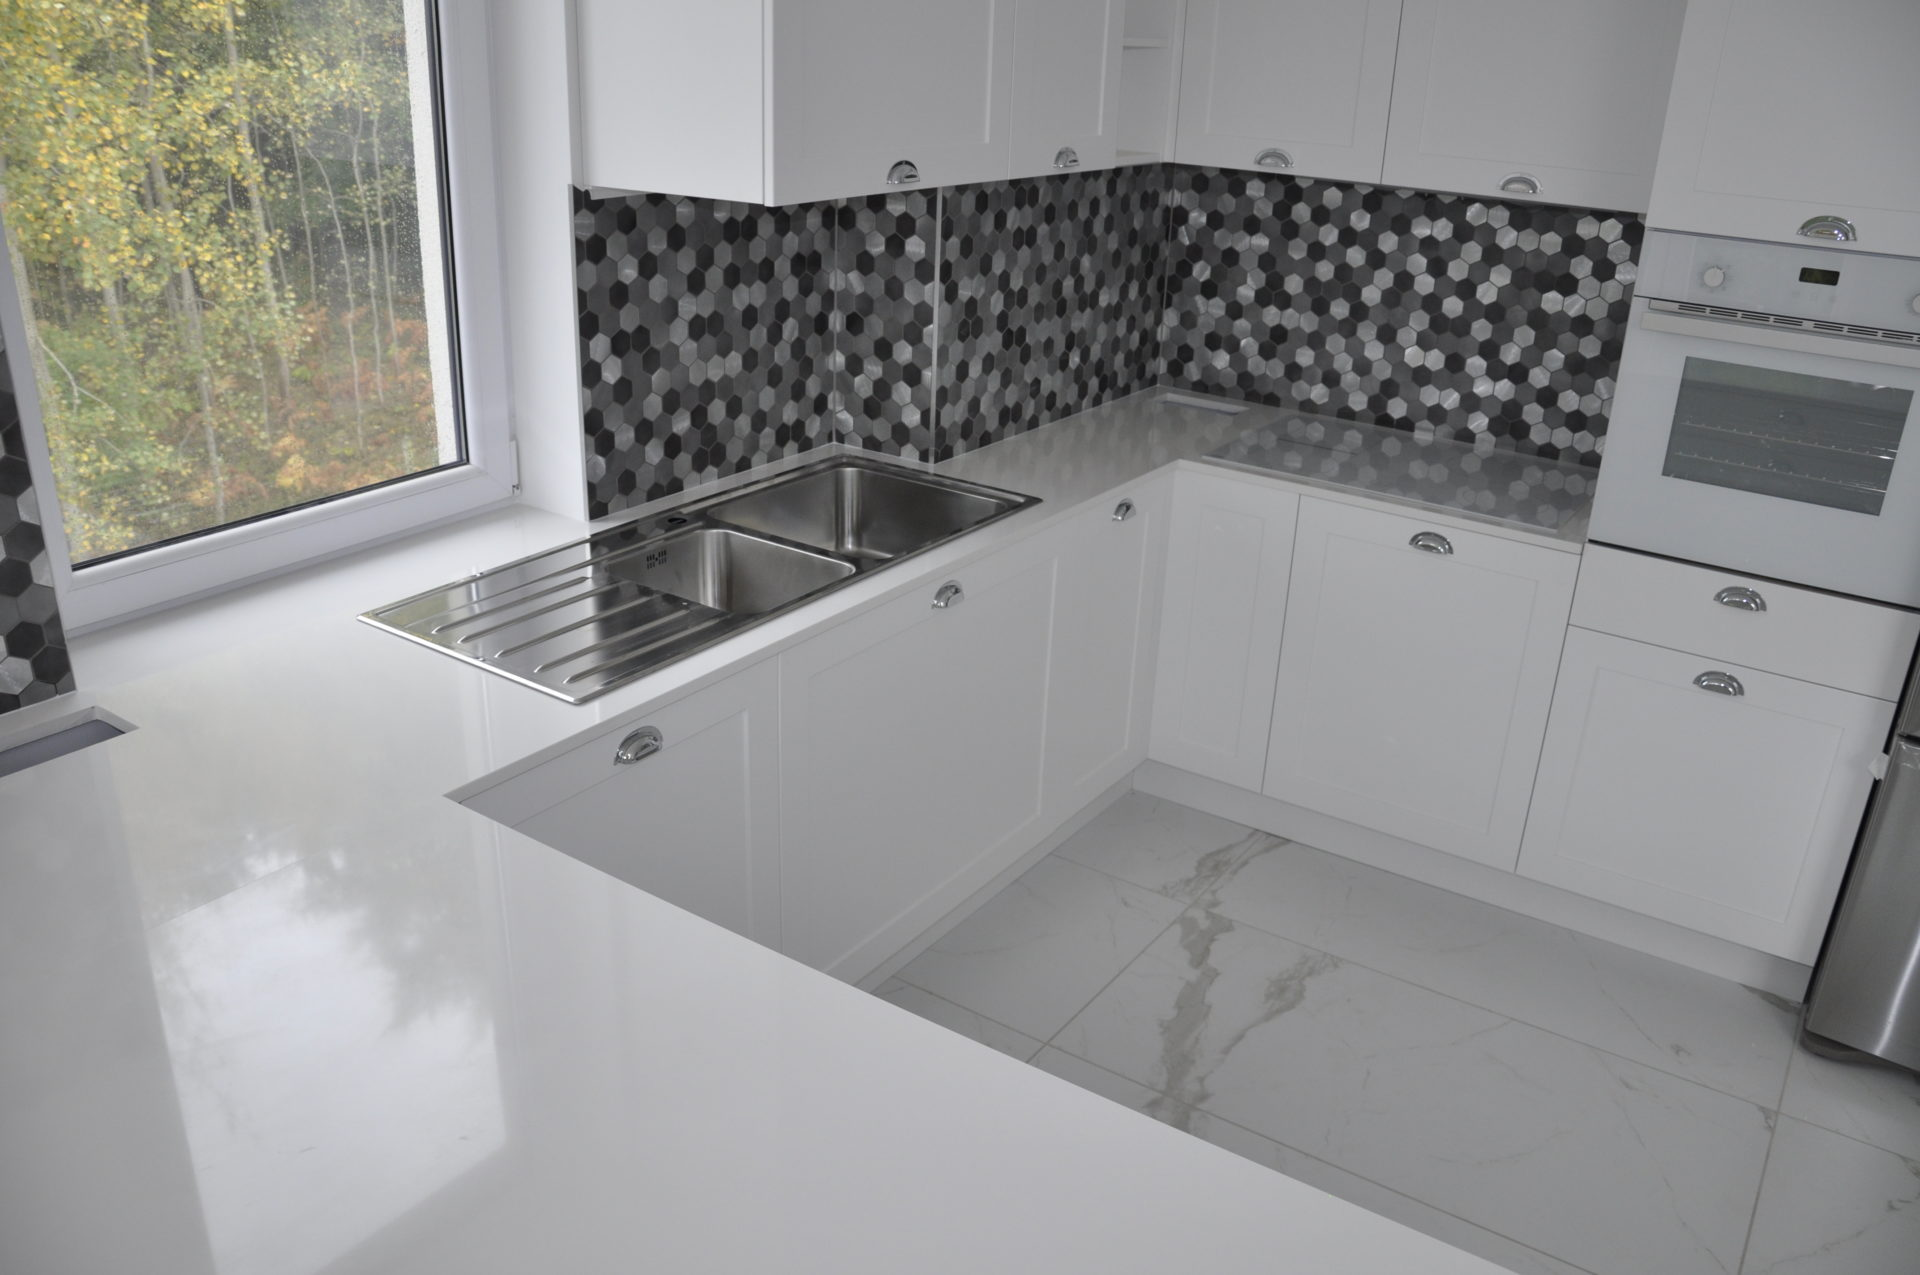 Konglomerat kwarcowy Biały Cool White 2cm PS Granit Gdynia